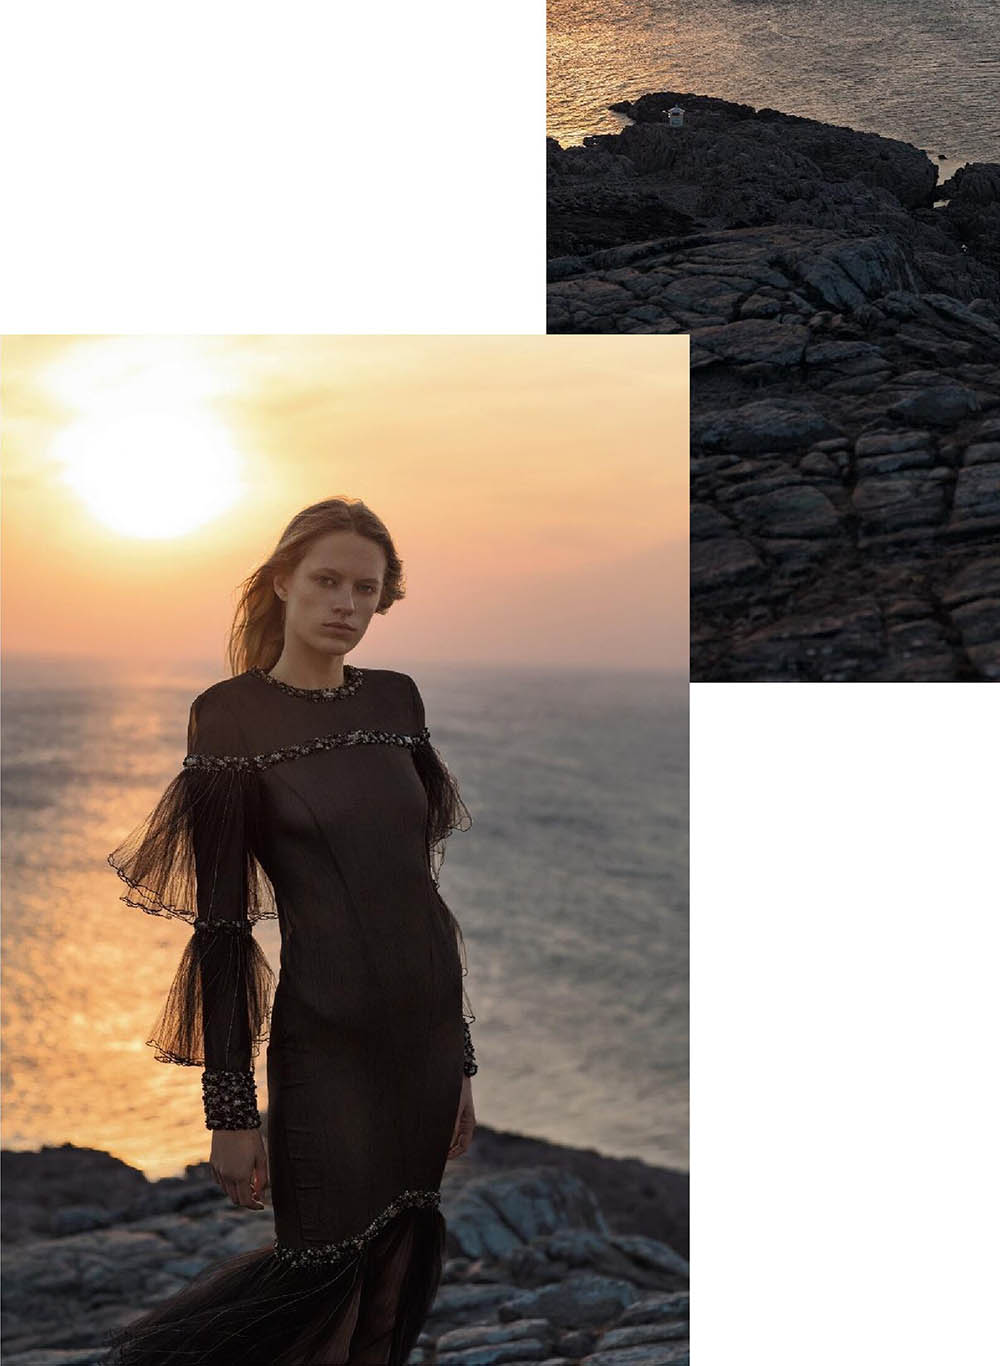 Kat Carter by Marco van Rijt for Numéro June/July 2019